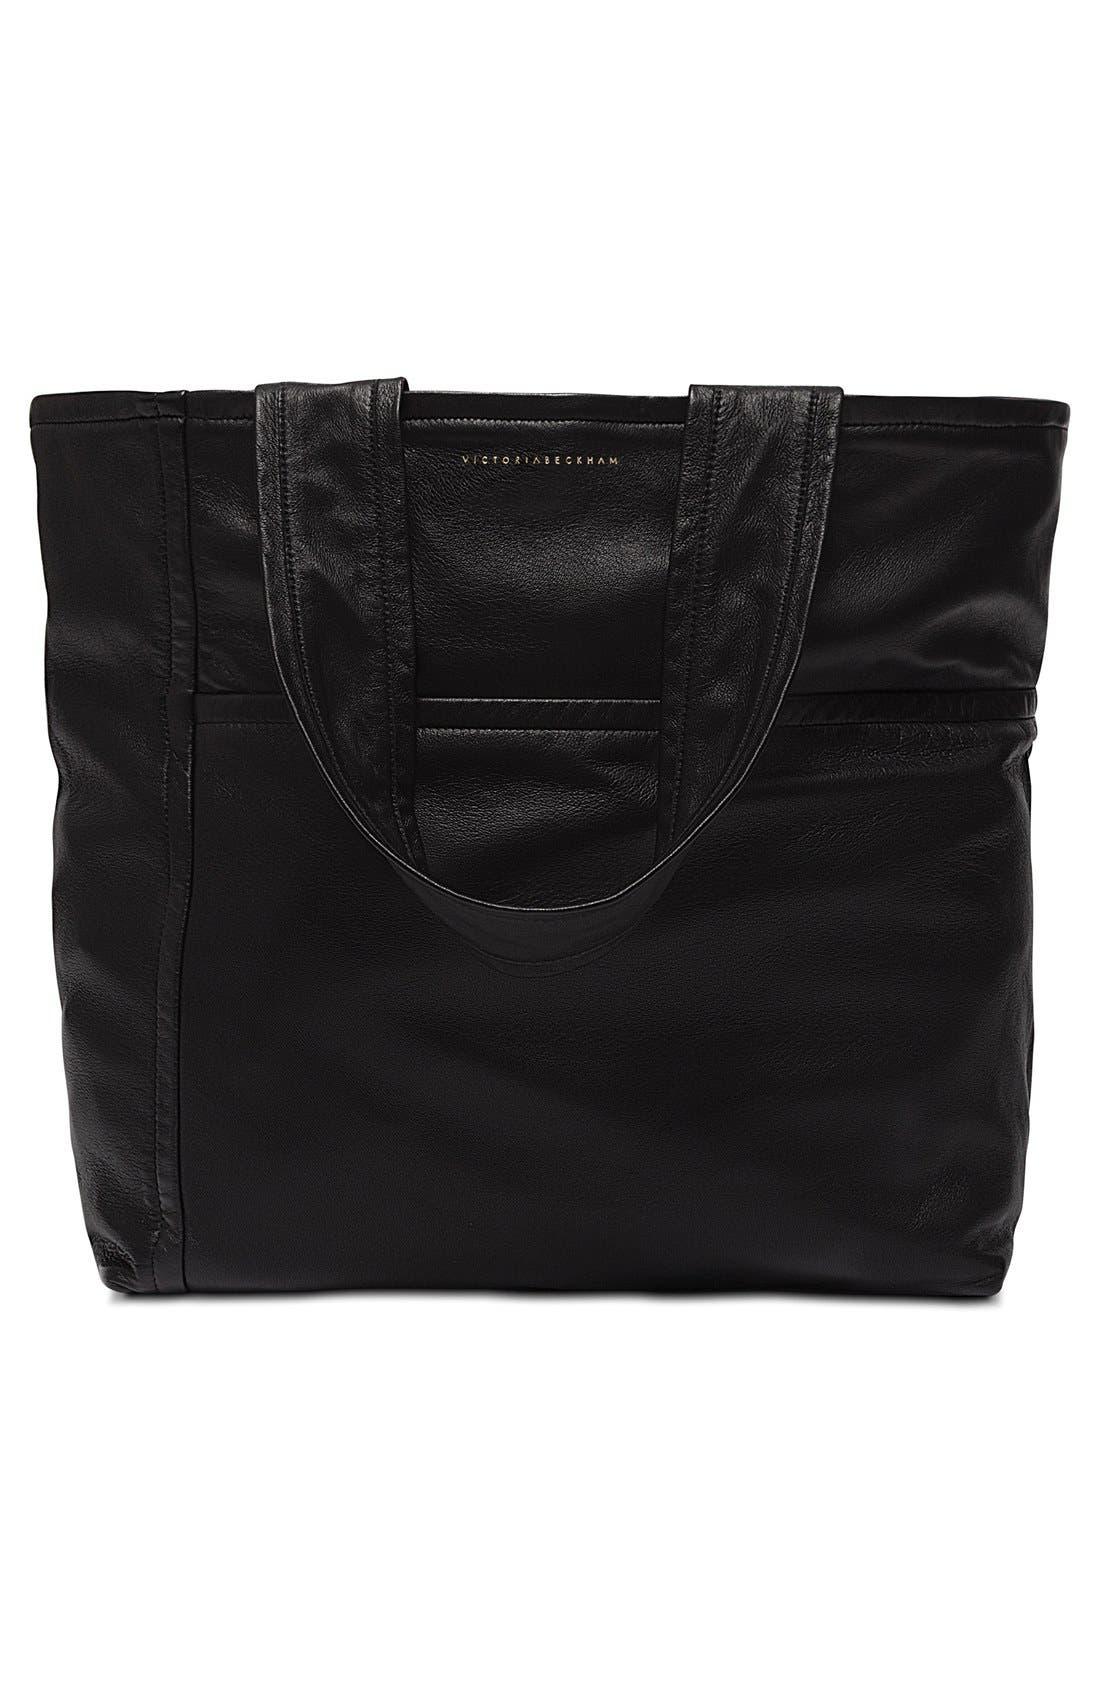 Sunday Bag,                         Main,                         color, 001